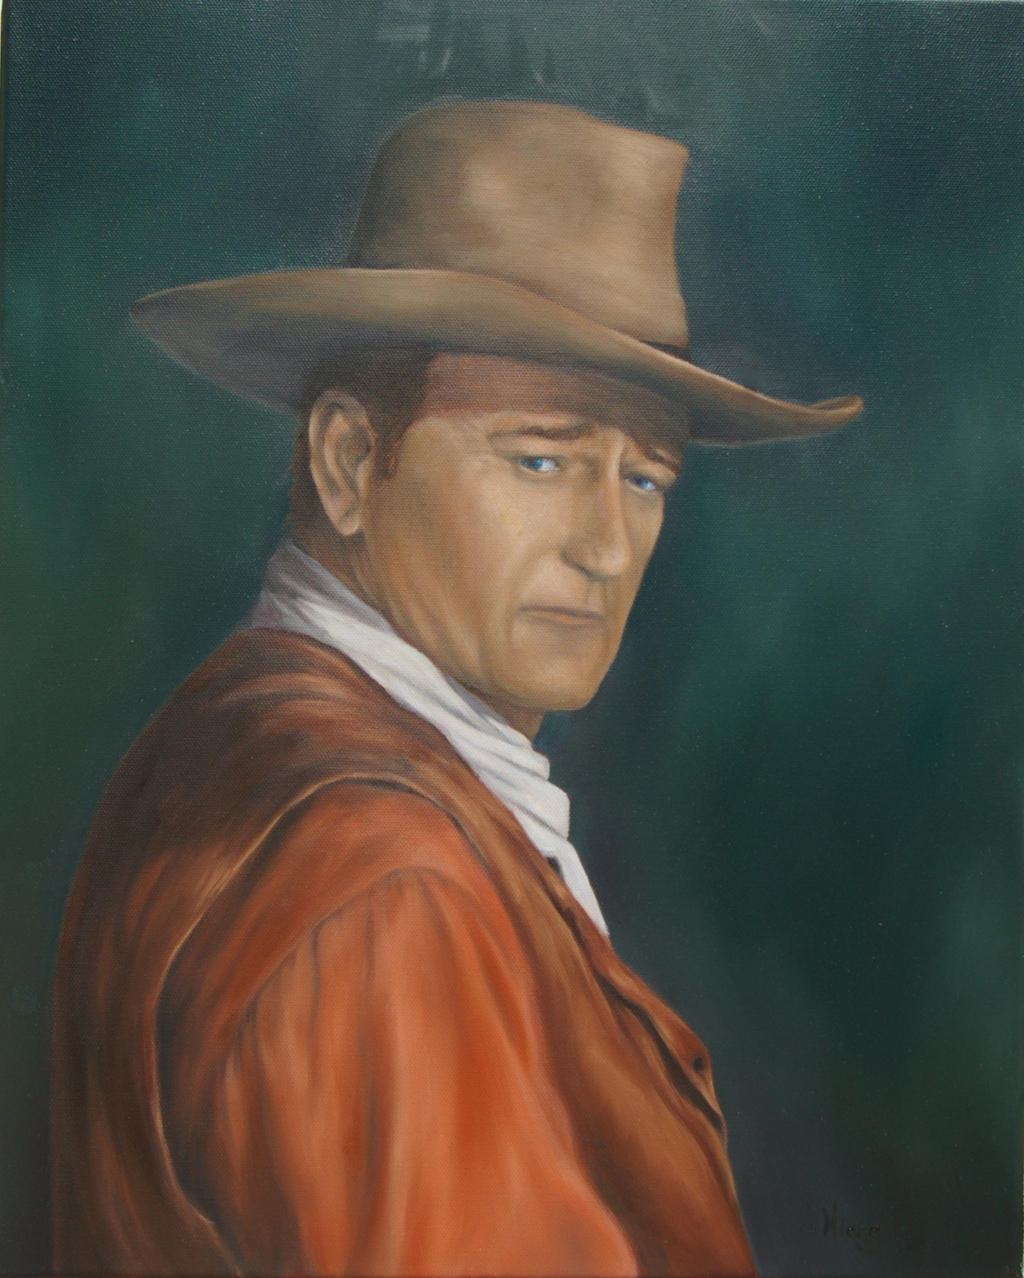 The Duke by Coi-kins